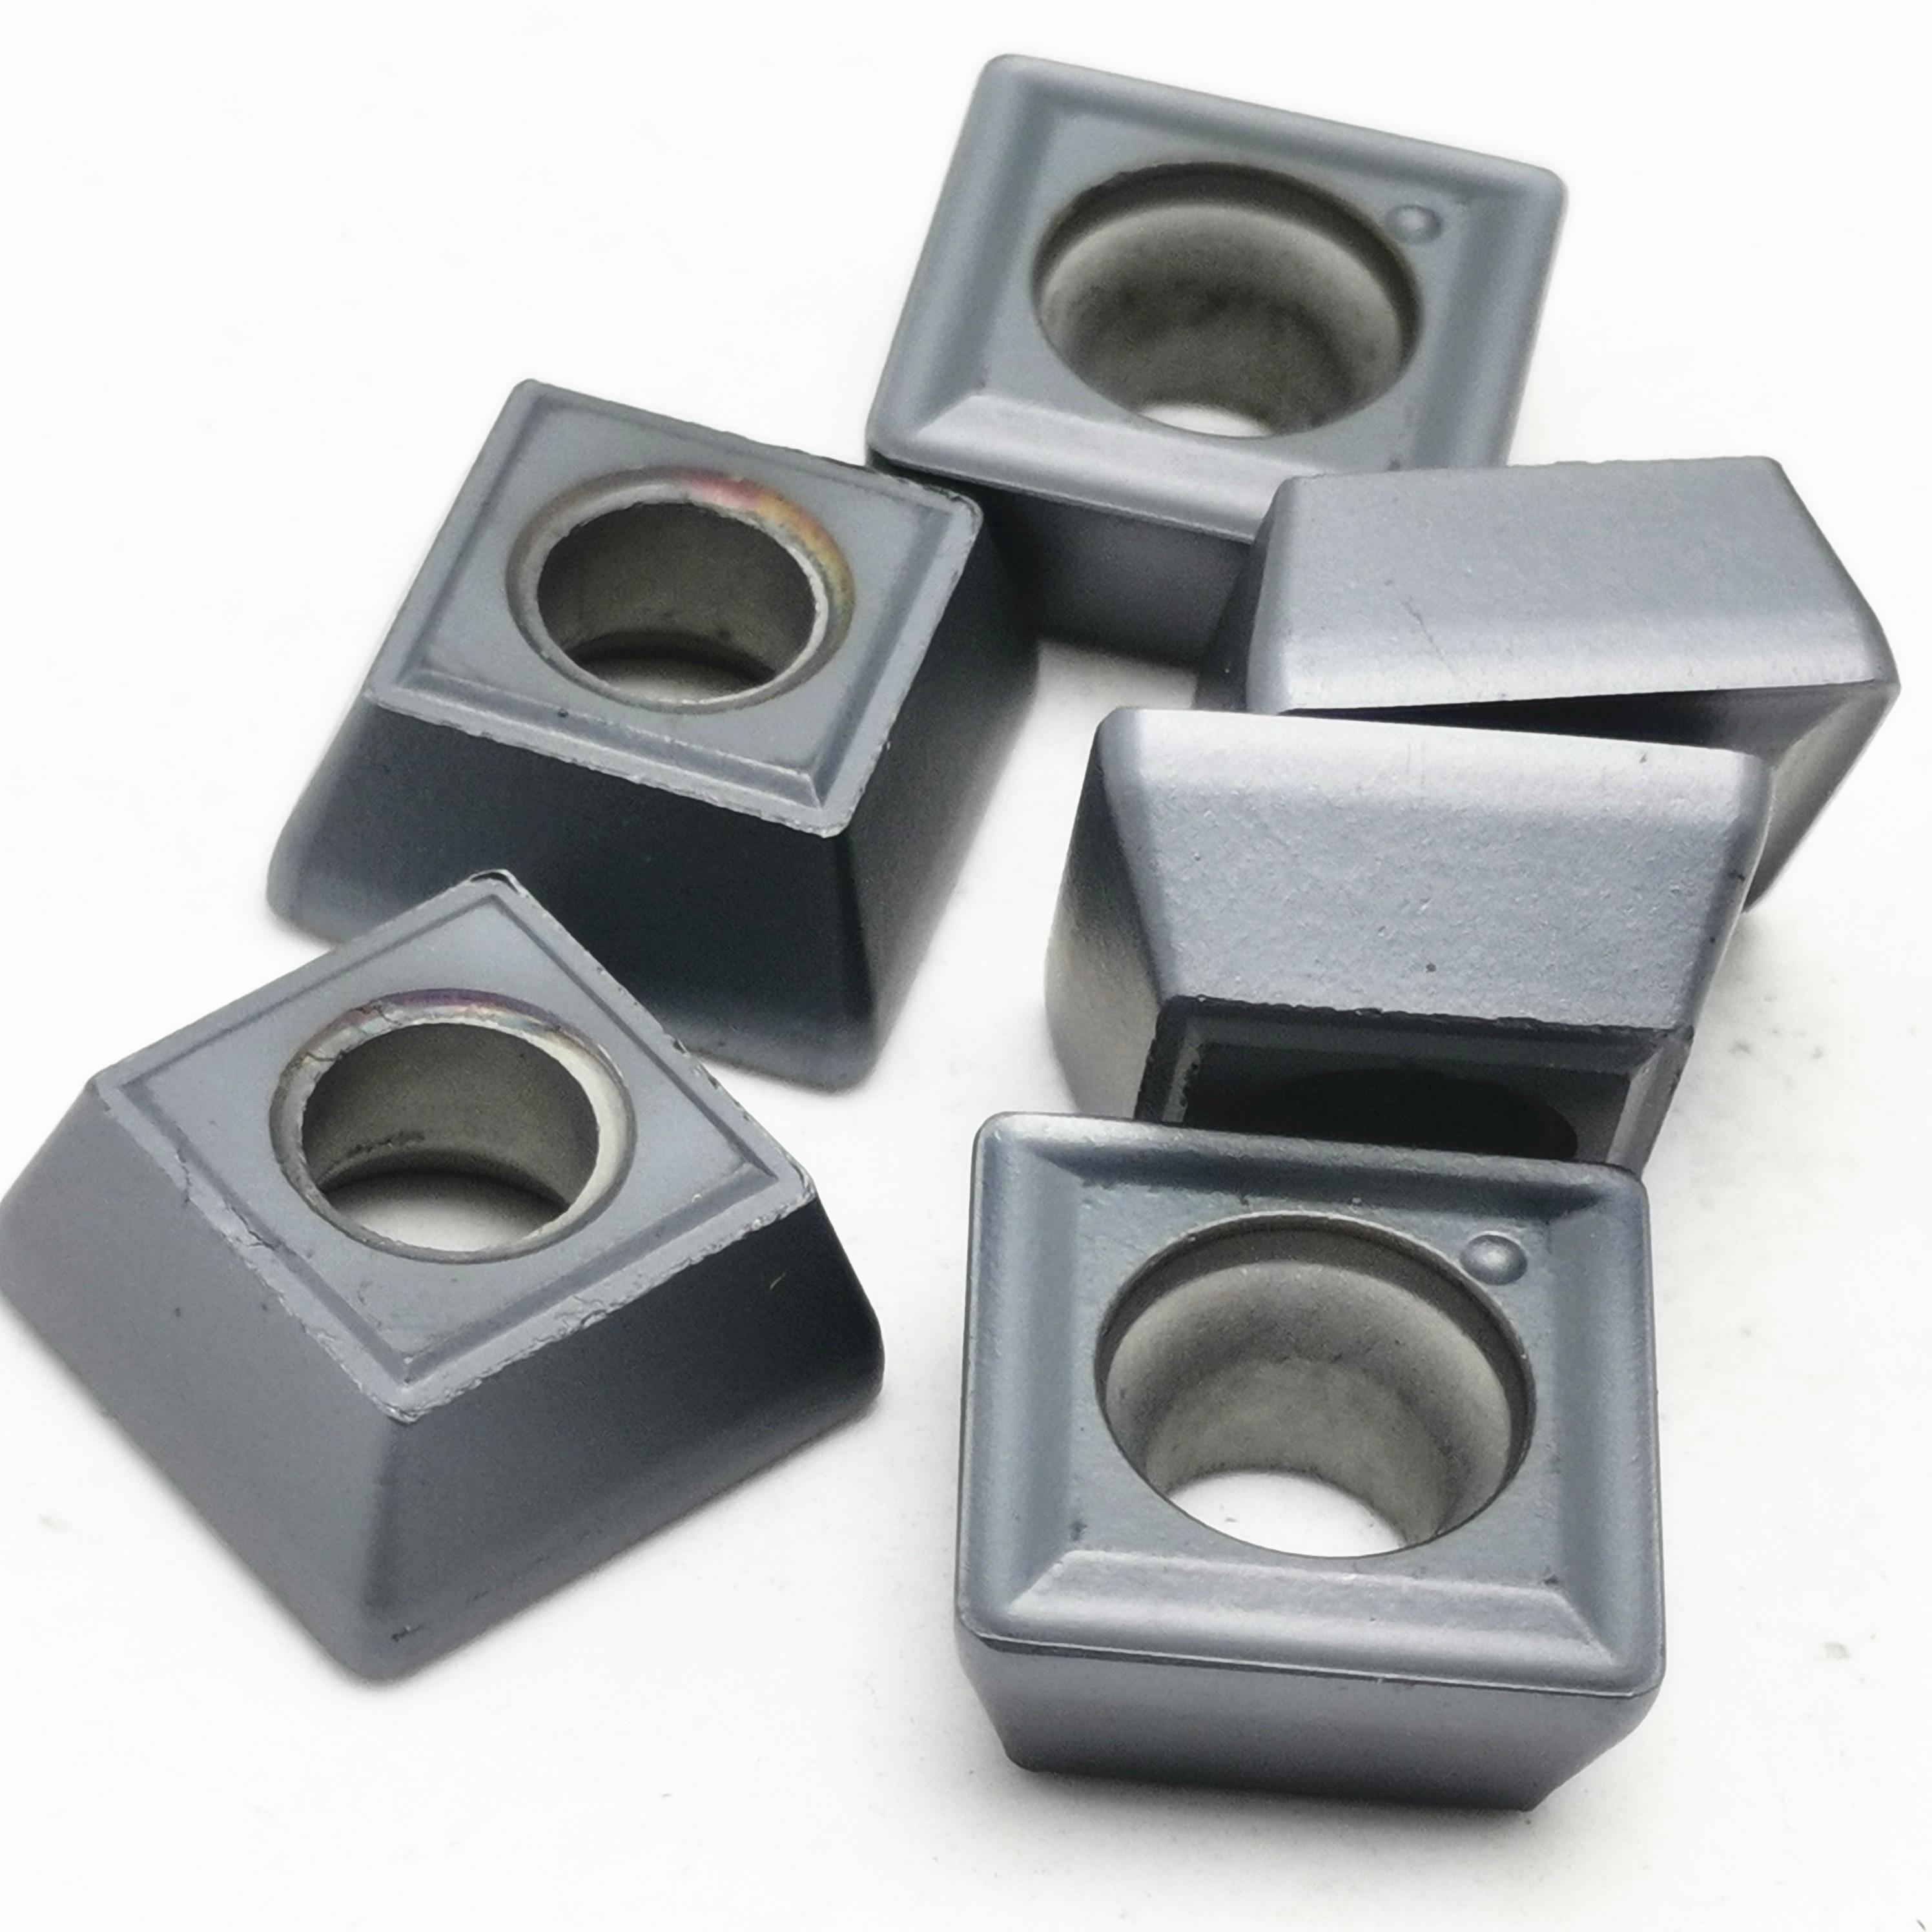 10PCS SPMG090408 DG TT9030 SPMG 090408  Carbide Insert Turning Tool Lathe Cutter Milling Cutter CNC Cutting Tool